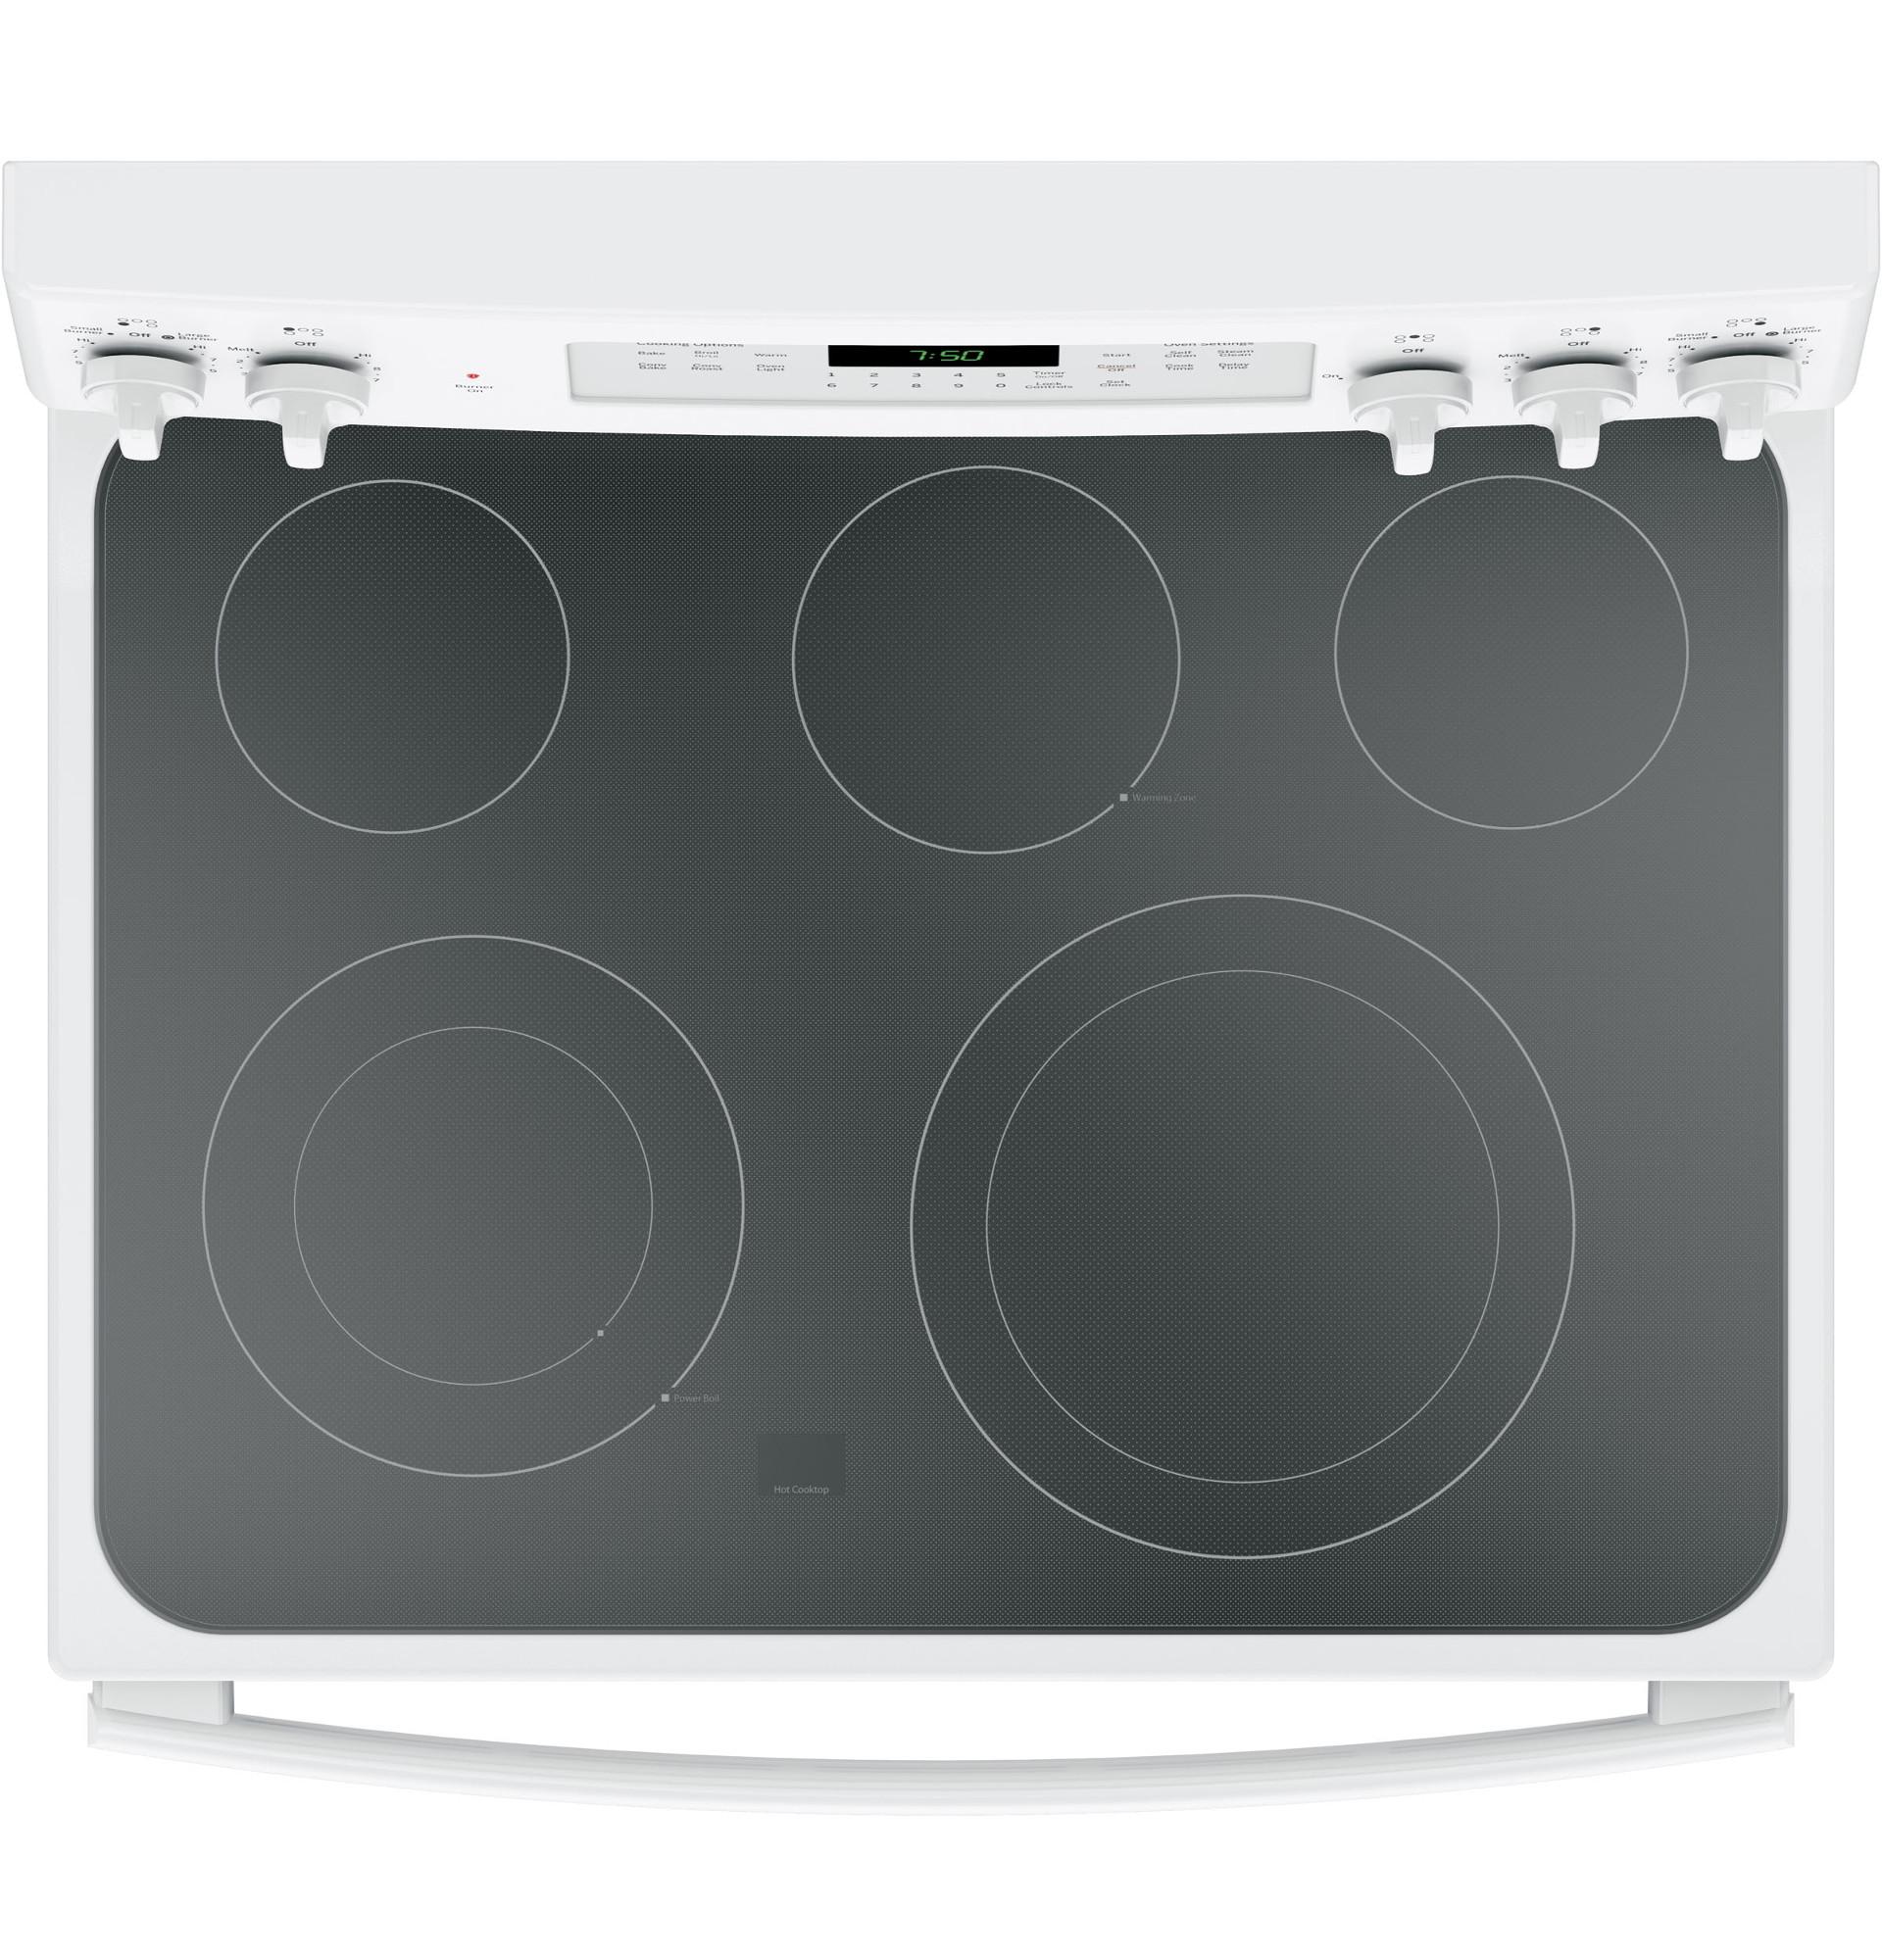 GE Appliances JB750DJWW 5.3 cu. ft. Freestanding Electric Range w/ True Convection - White